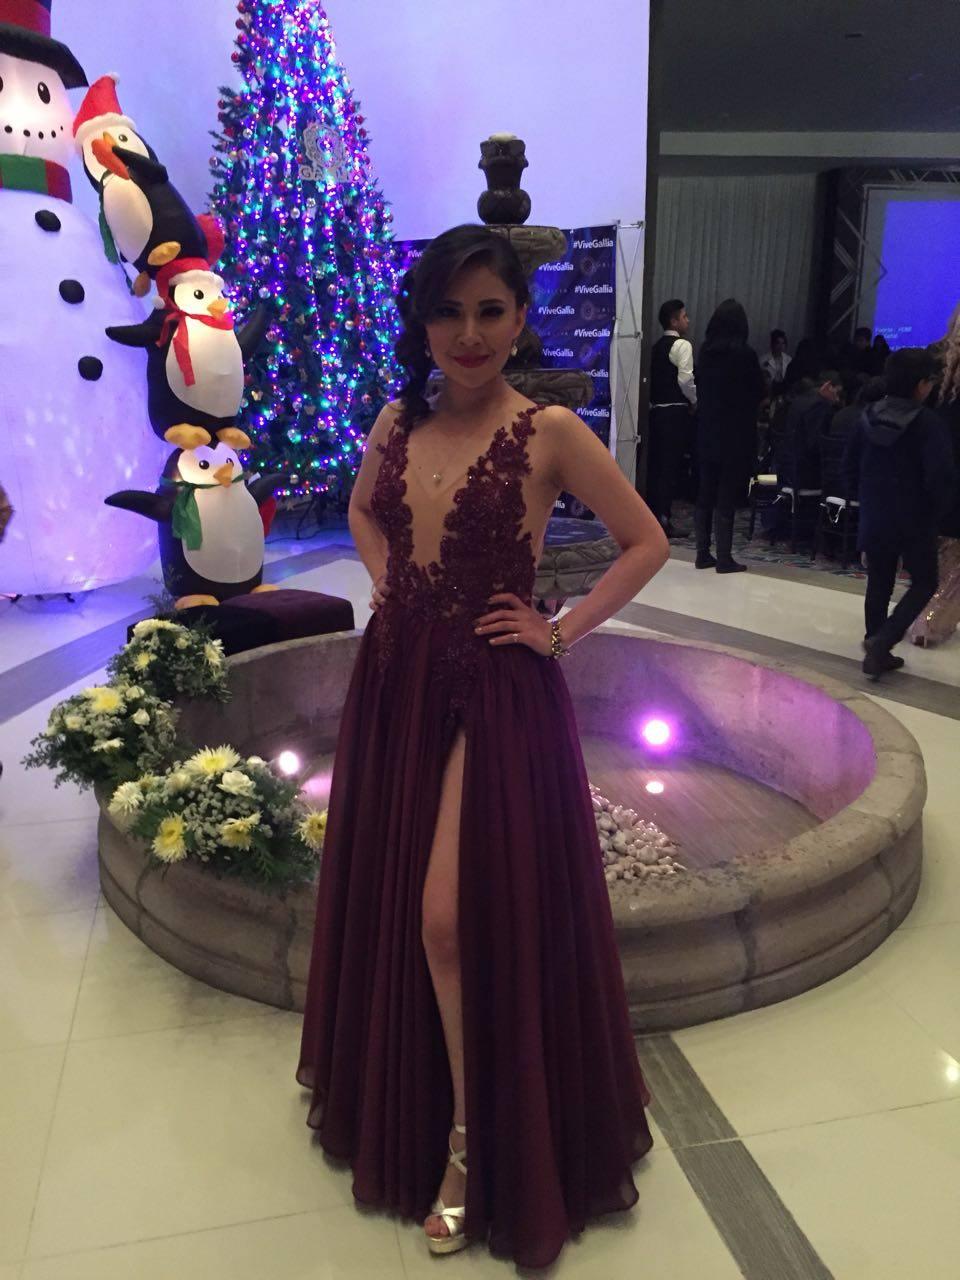 vestido de noche Pachuca | Irma Caroline 7717091016